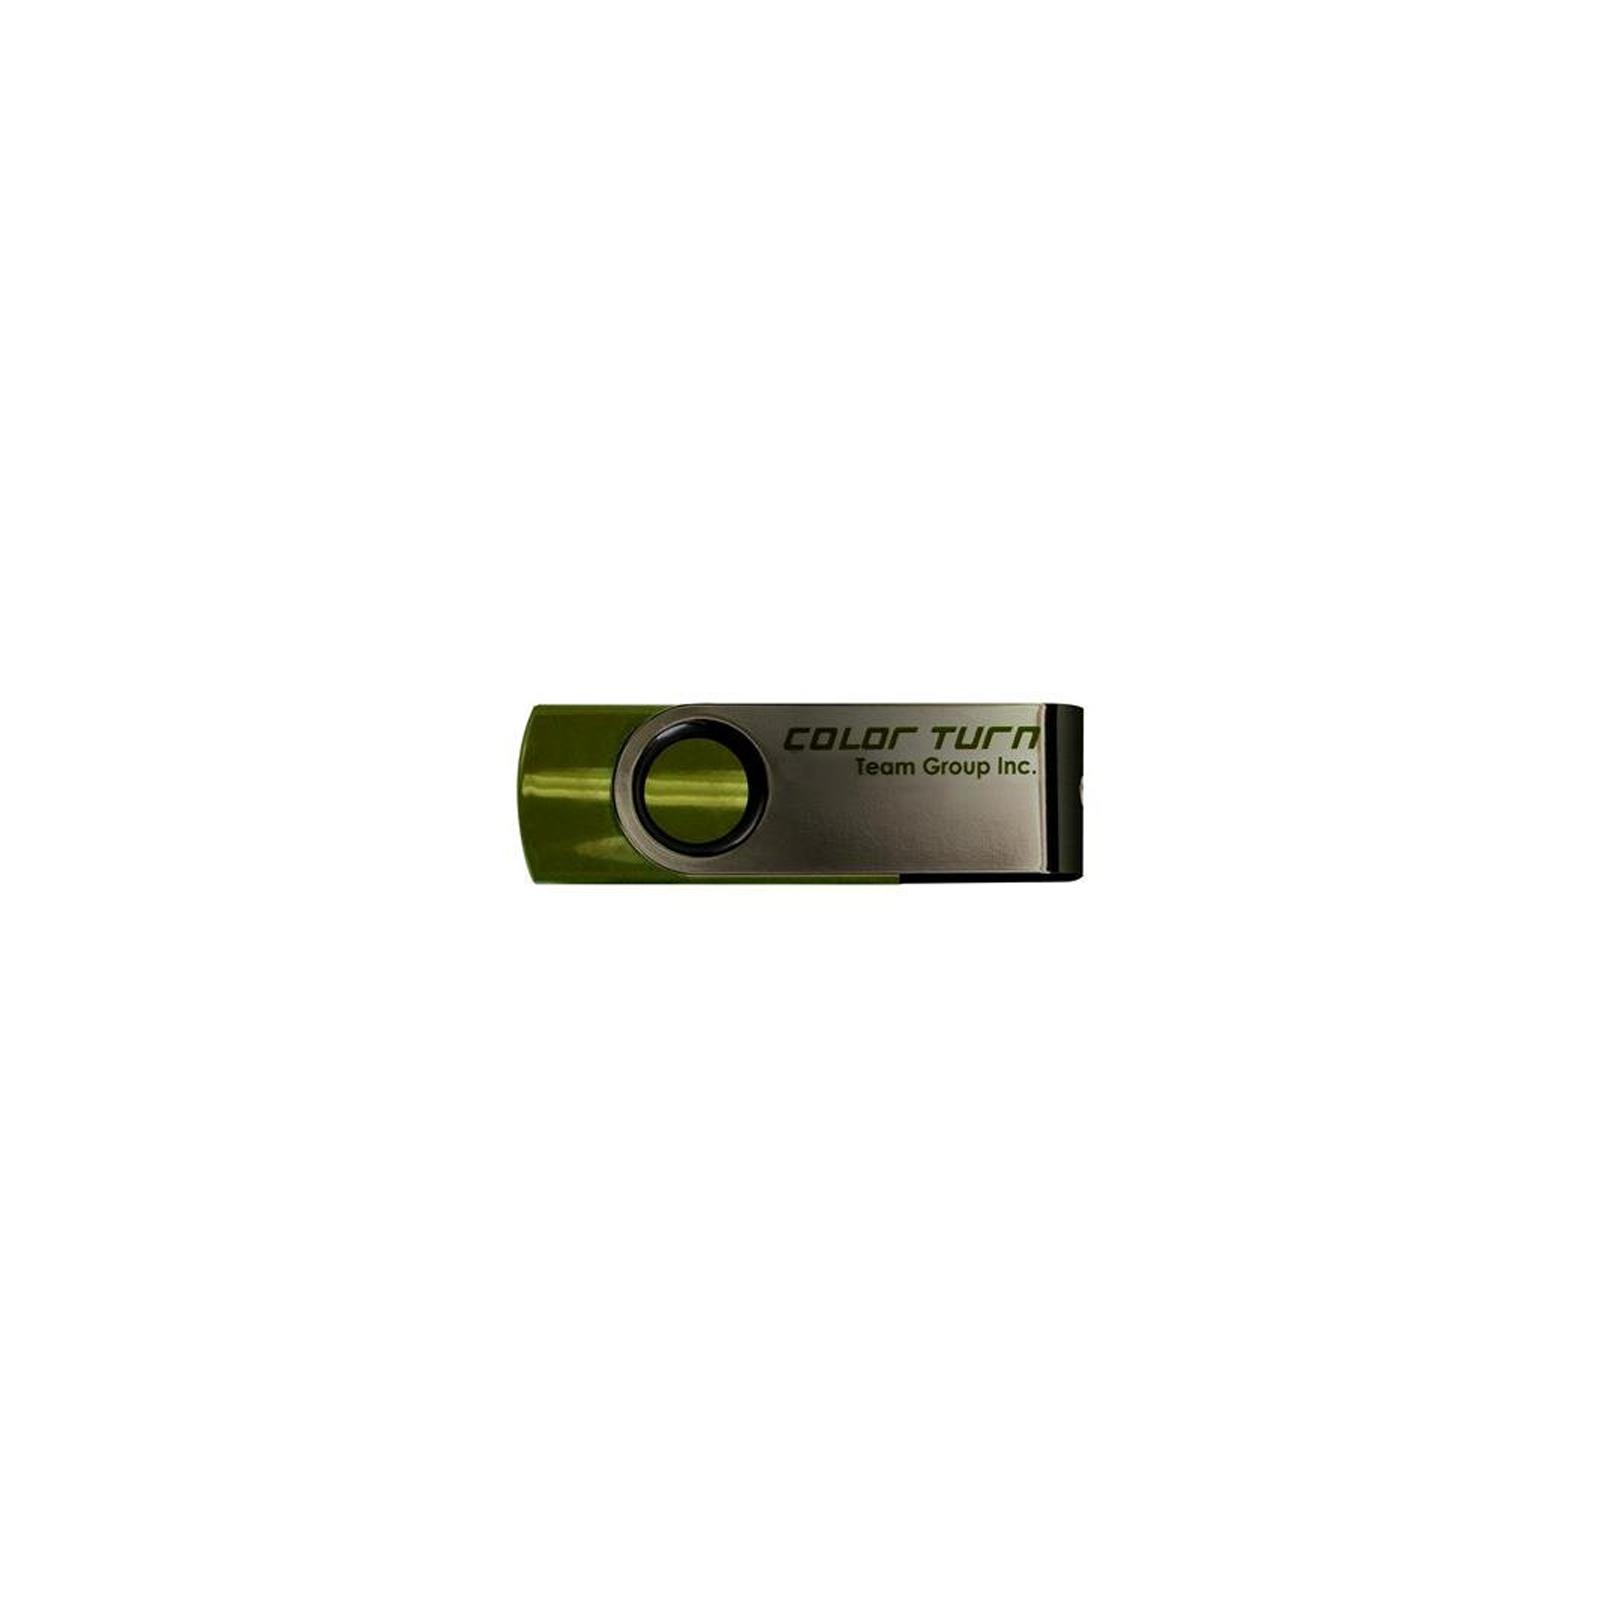 USB флеш накопитель Team 16GB Color Turn E902 Green USB 2.0 (TE90216GG01)